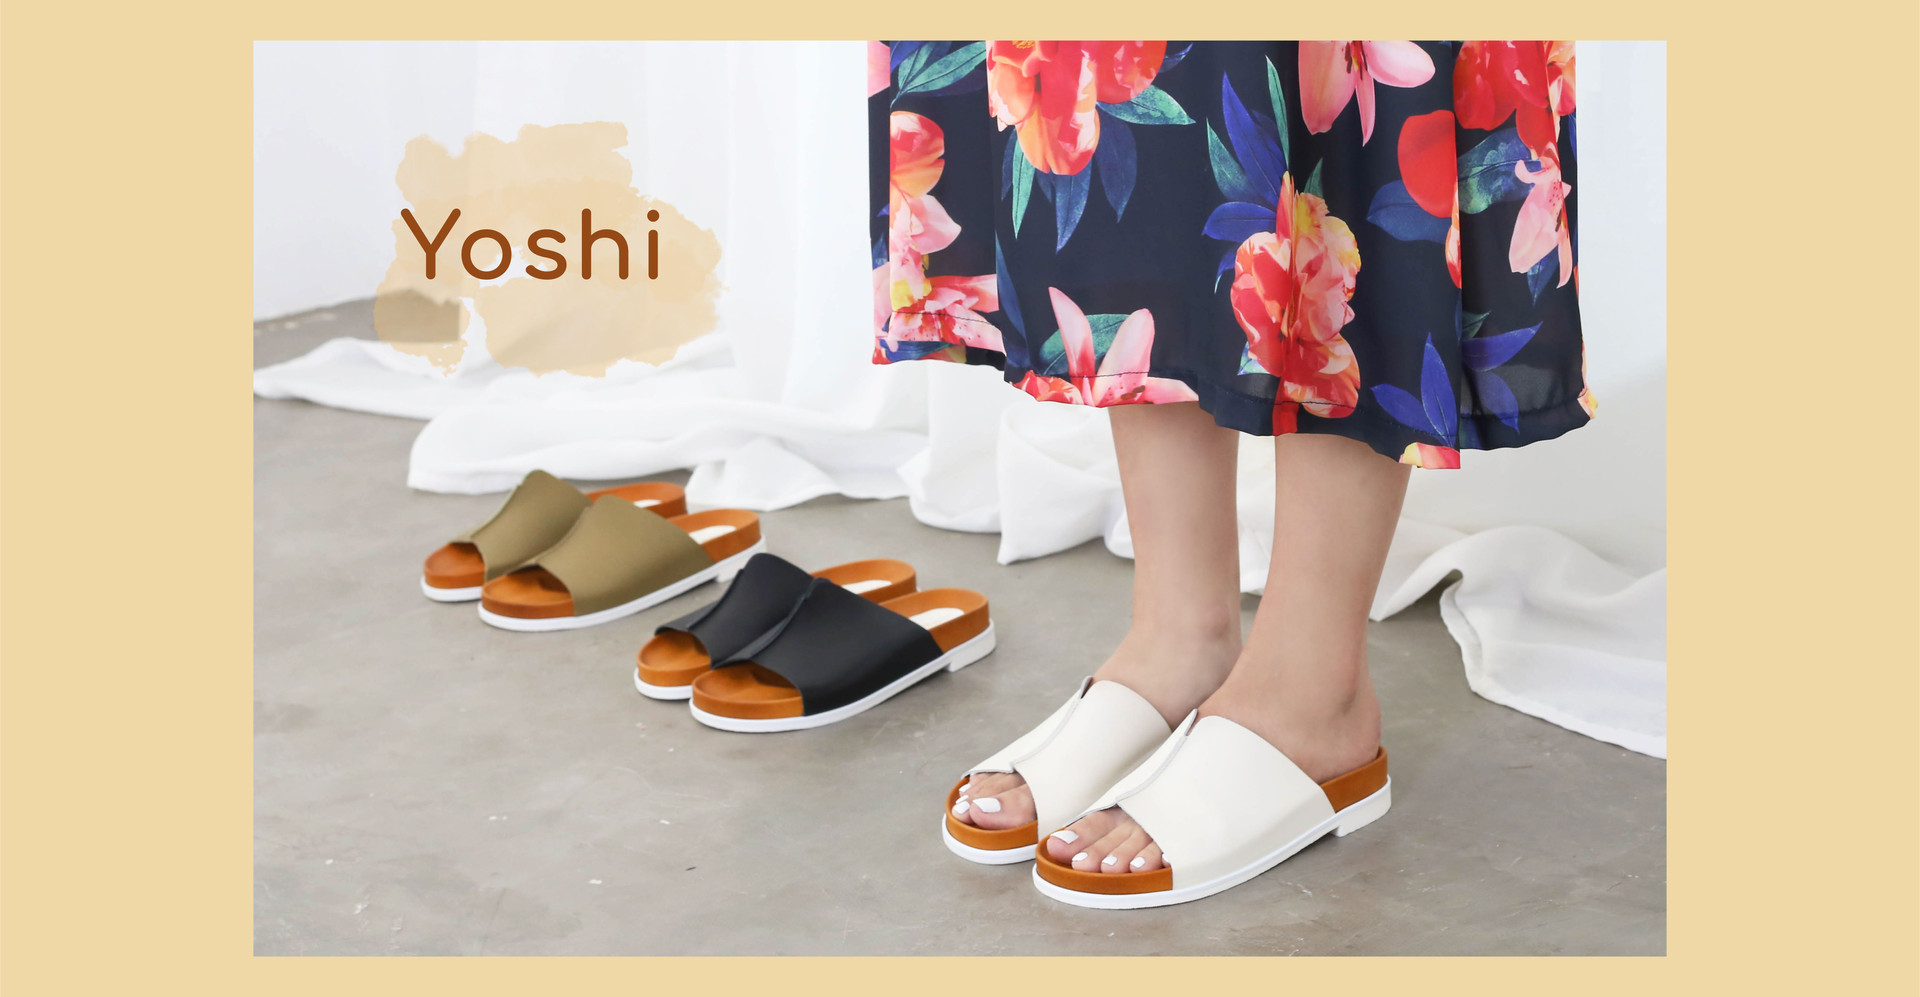 Yoshi น้องใหม่ Sandals หนังแท้ นุ่มสบายเท้าในราคาสบายกระเป๋า ที่เราจัดมาคืนกำไรให้ทุกคน - 2880 THB